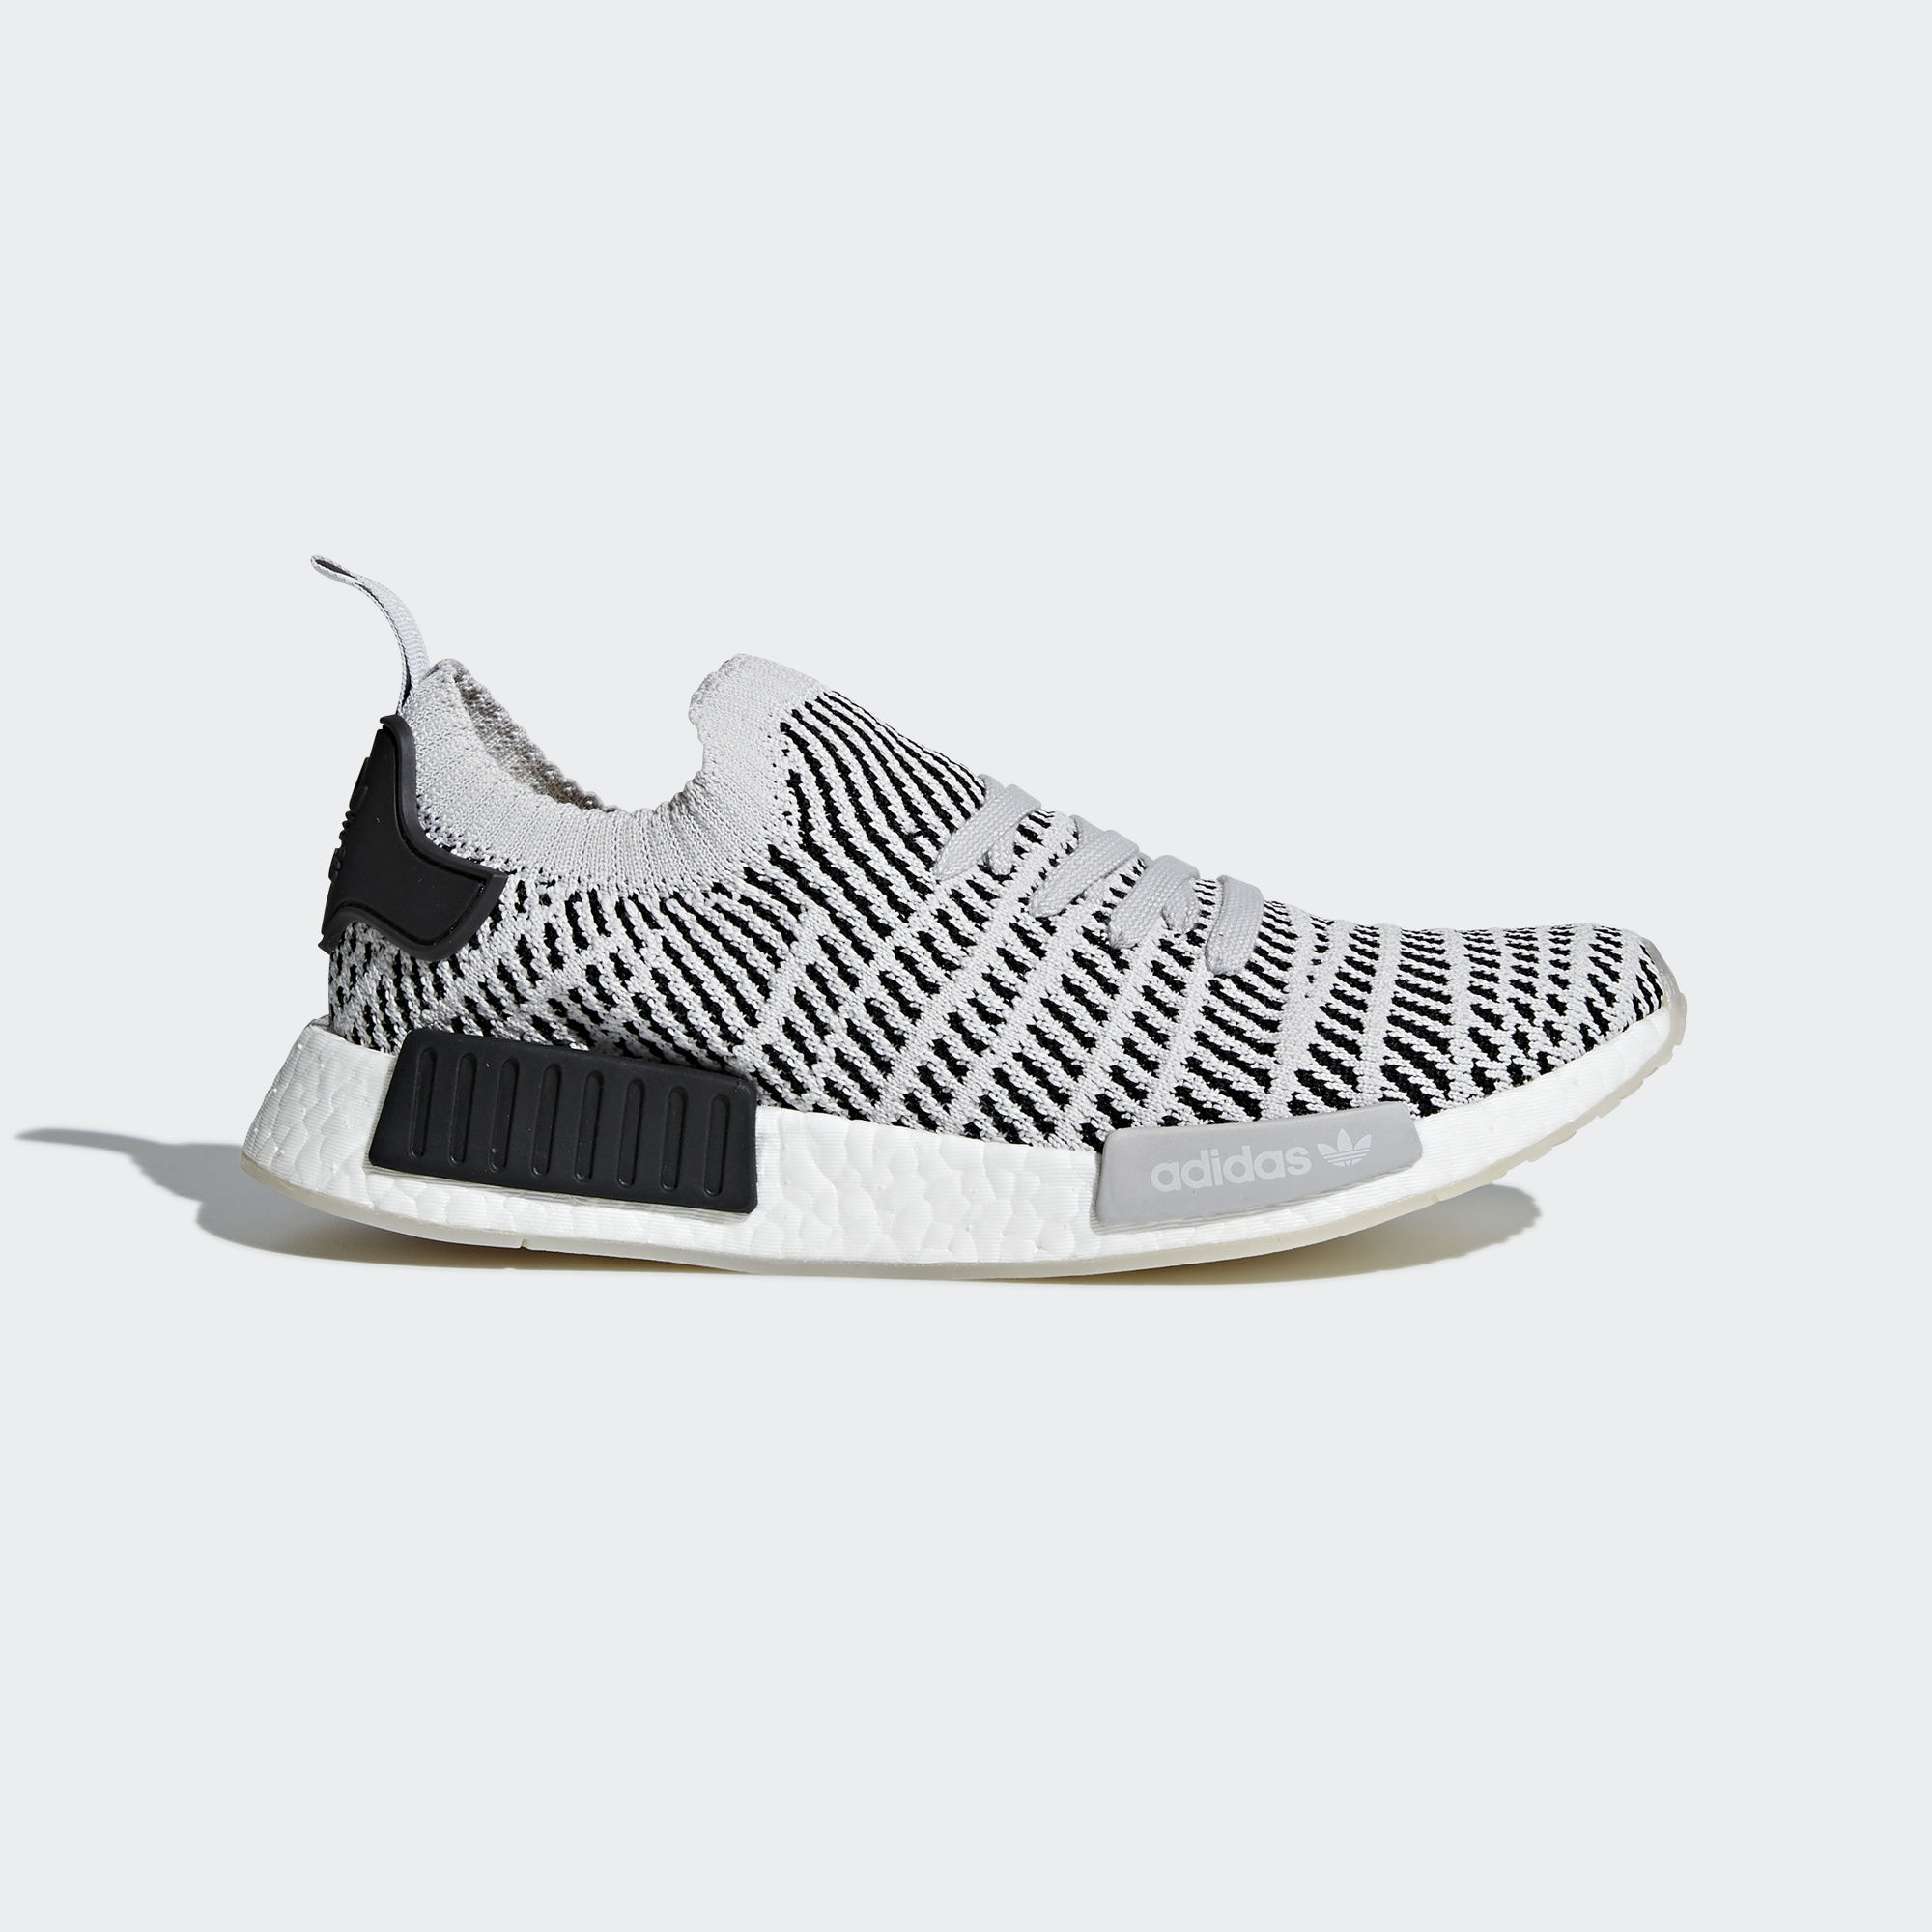 Nmd_r1 Stlt Primeknit Shoes   Shoppa Online   Afound